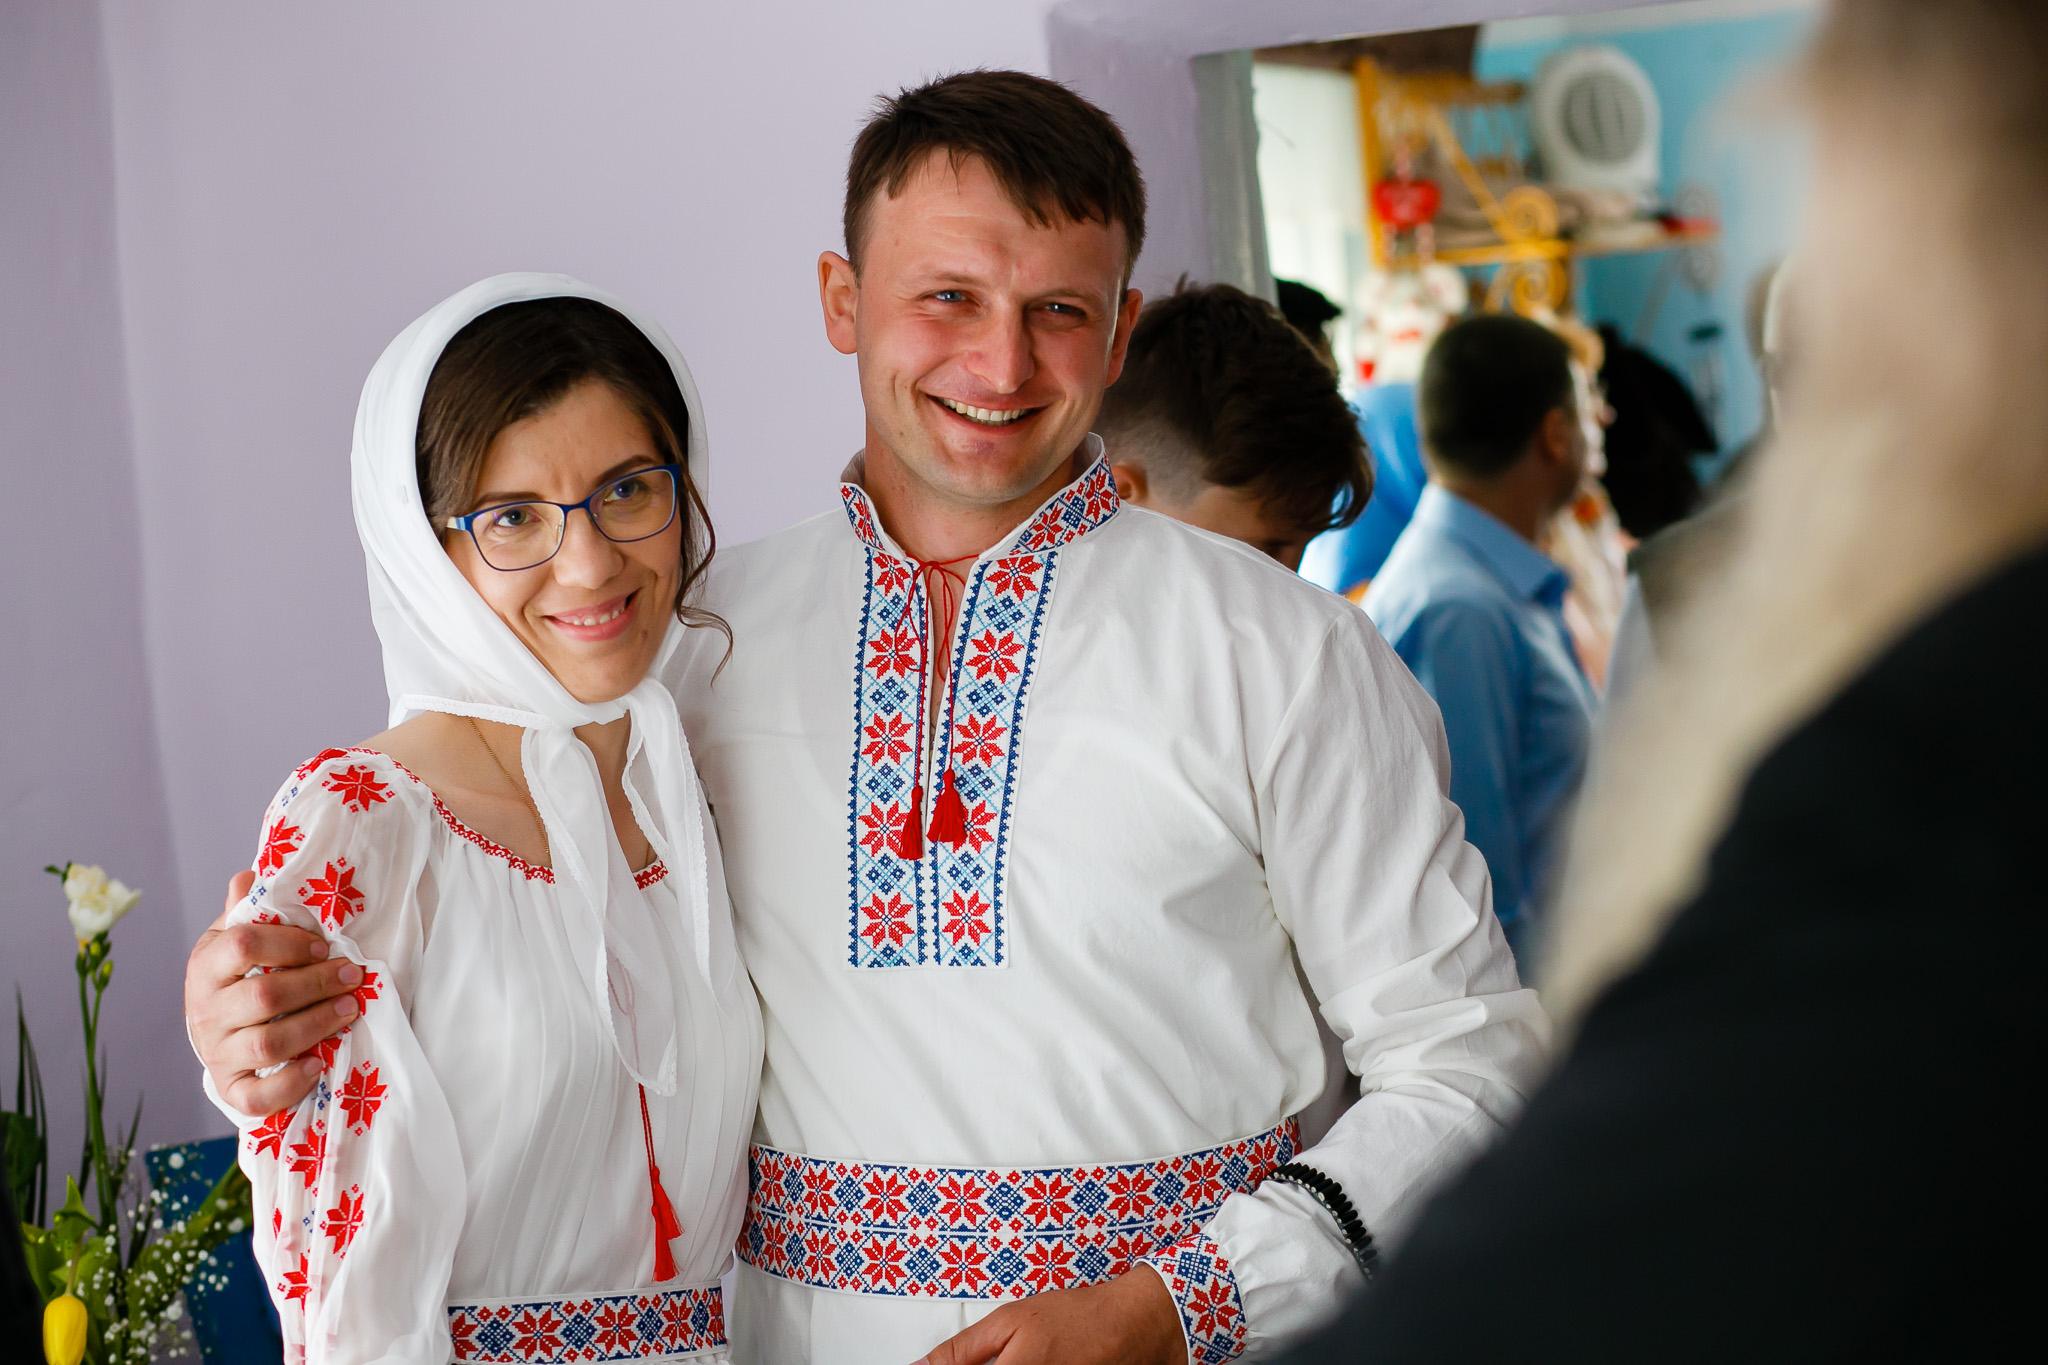 Nuntă tradițională Elisabeta și Alexandru fotograf profesionist nunta Iasi www.paulpadurariu.ro © 2018 Paul Padurariu pregatiri miri 8